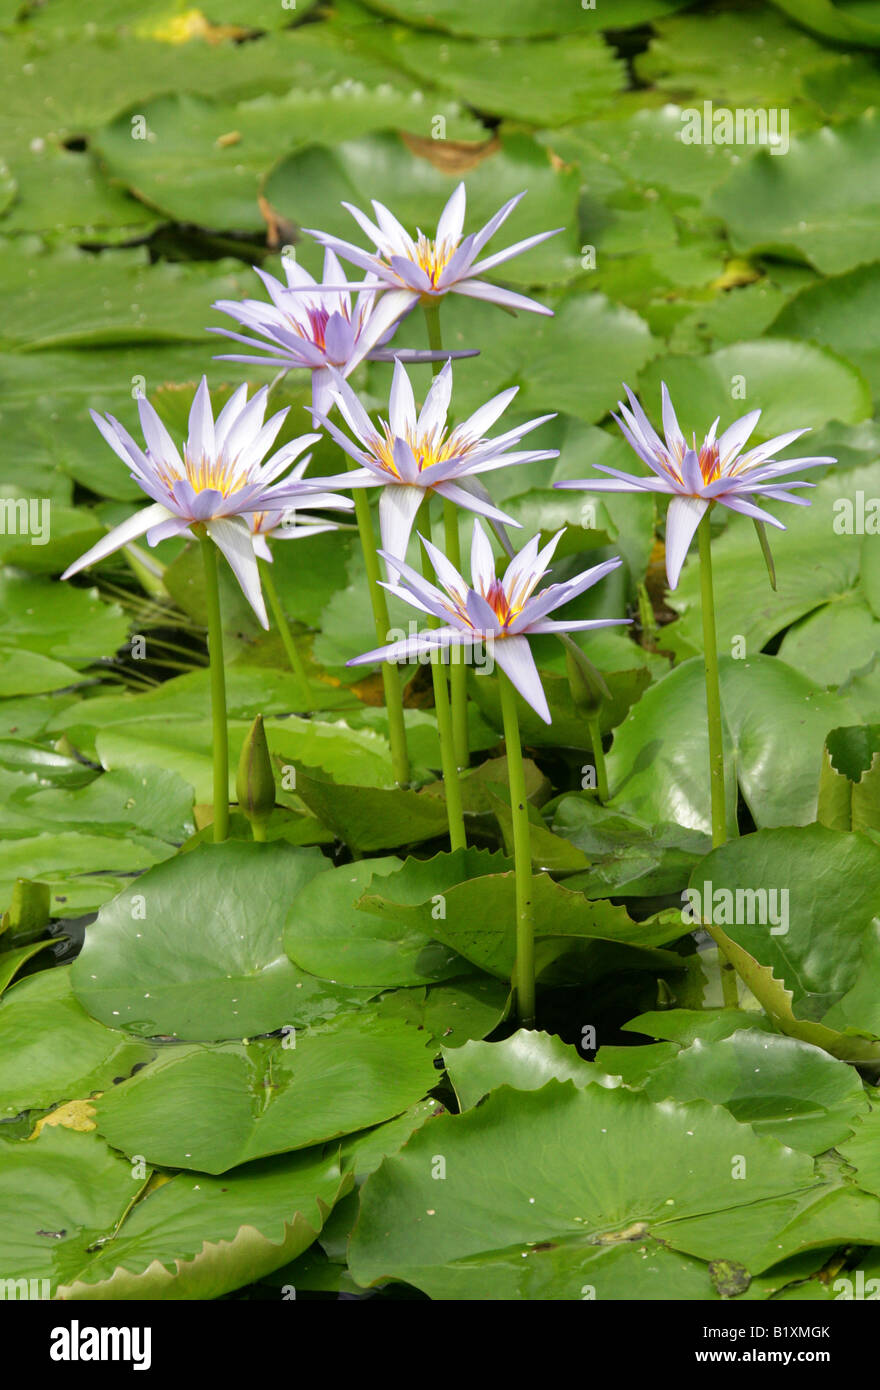 Waterlillies, Nymphaeaceae Stock Photo